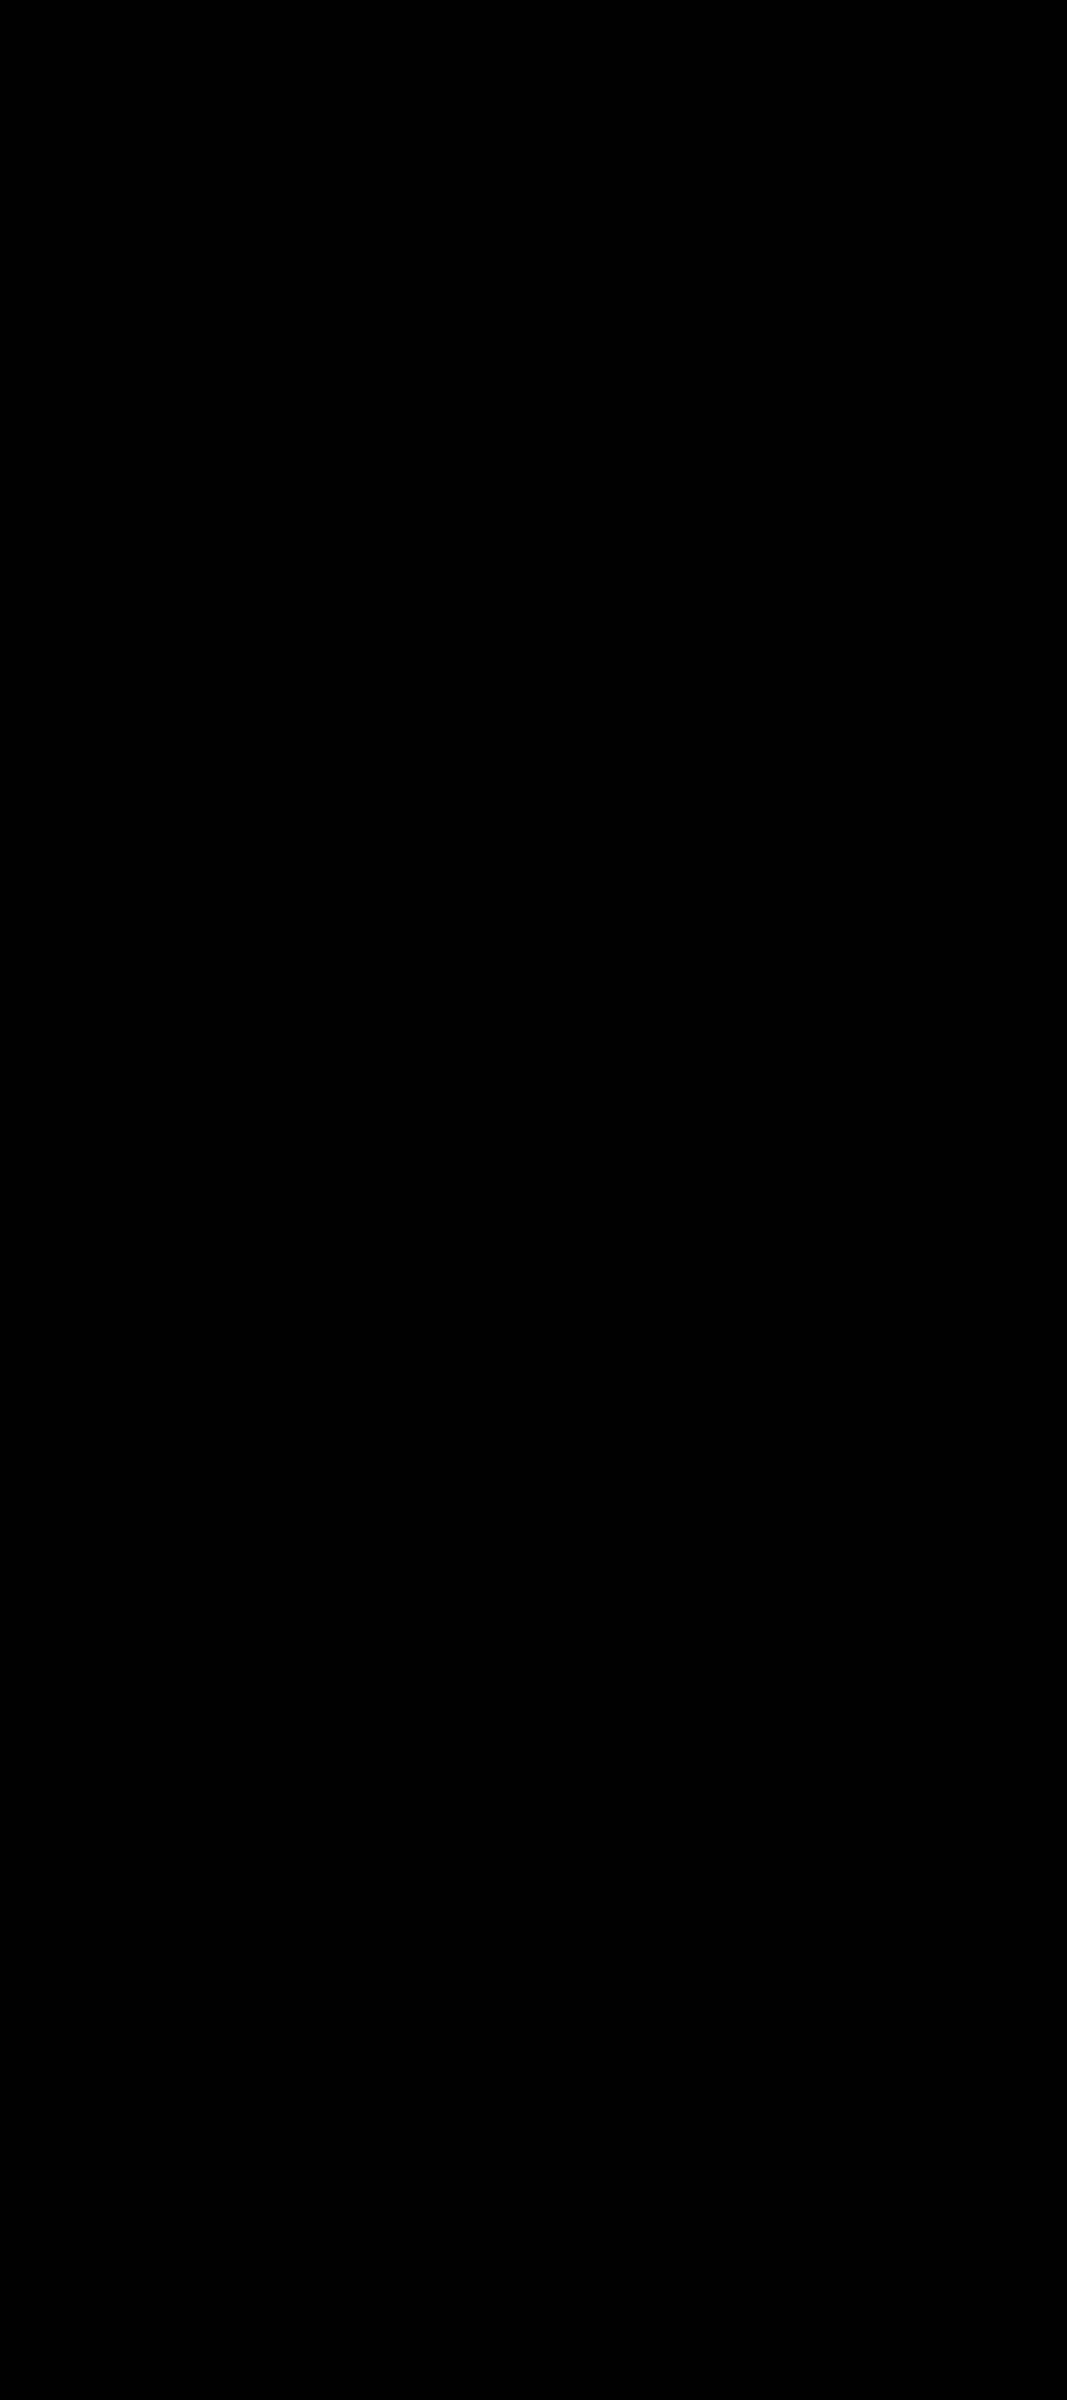 Zip PNG Image Background.